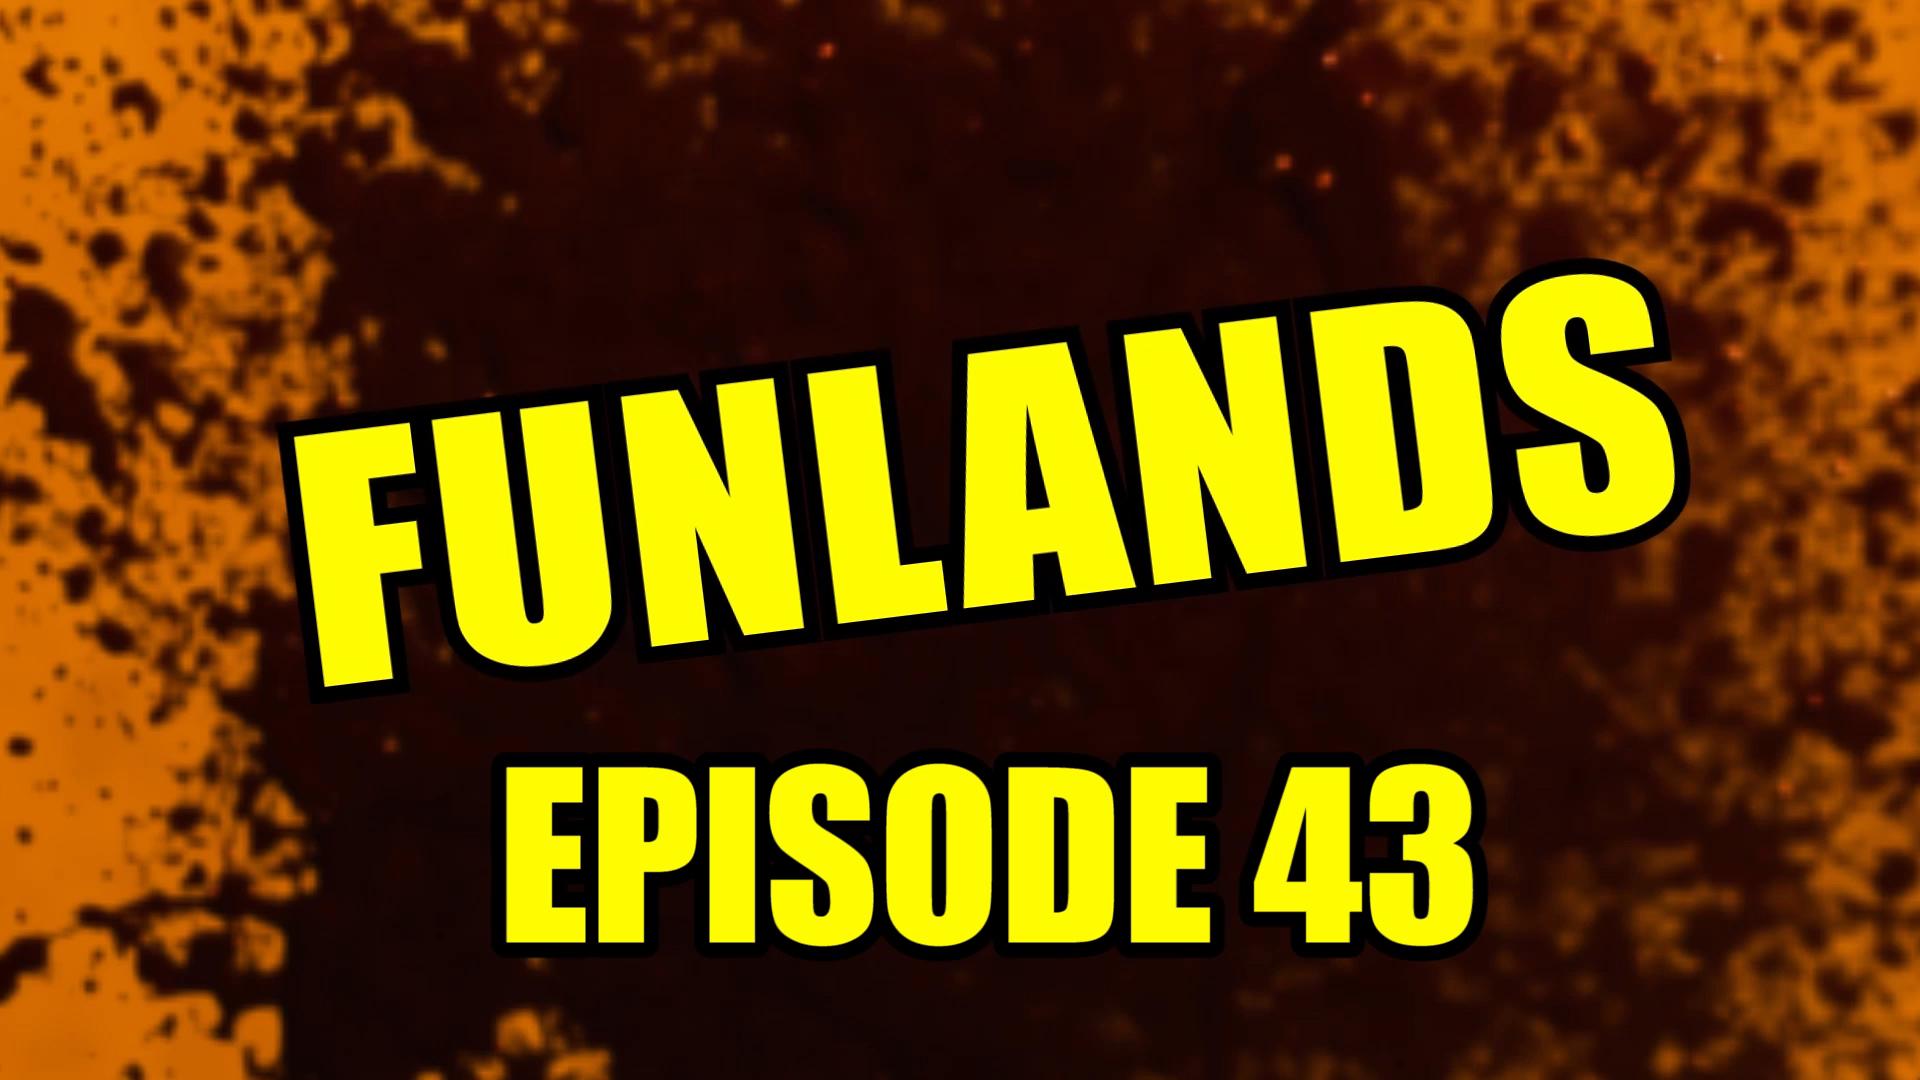 Funlands Episode 43.jpg